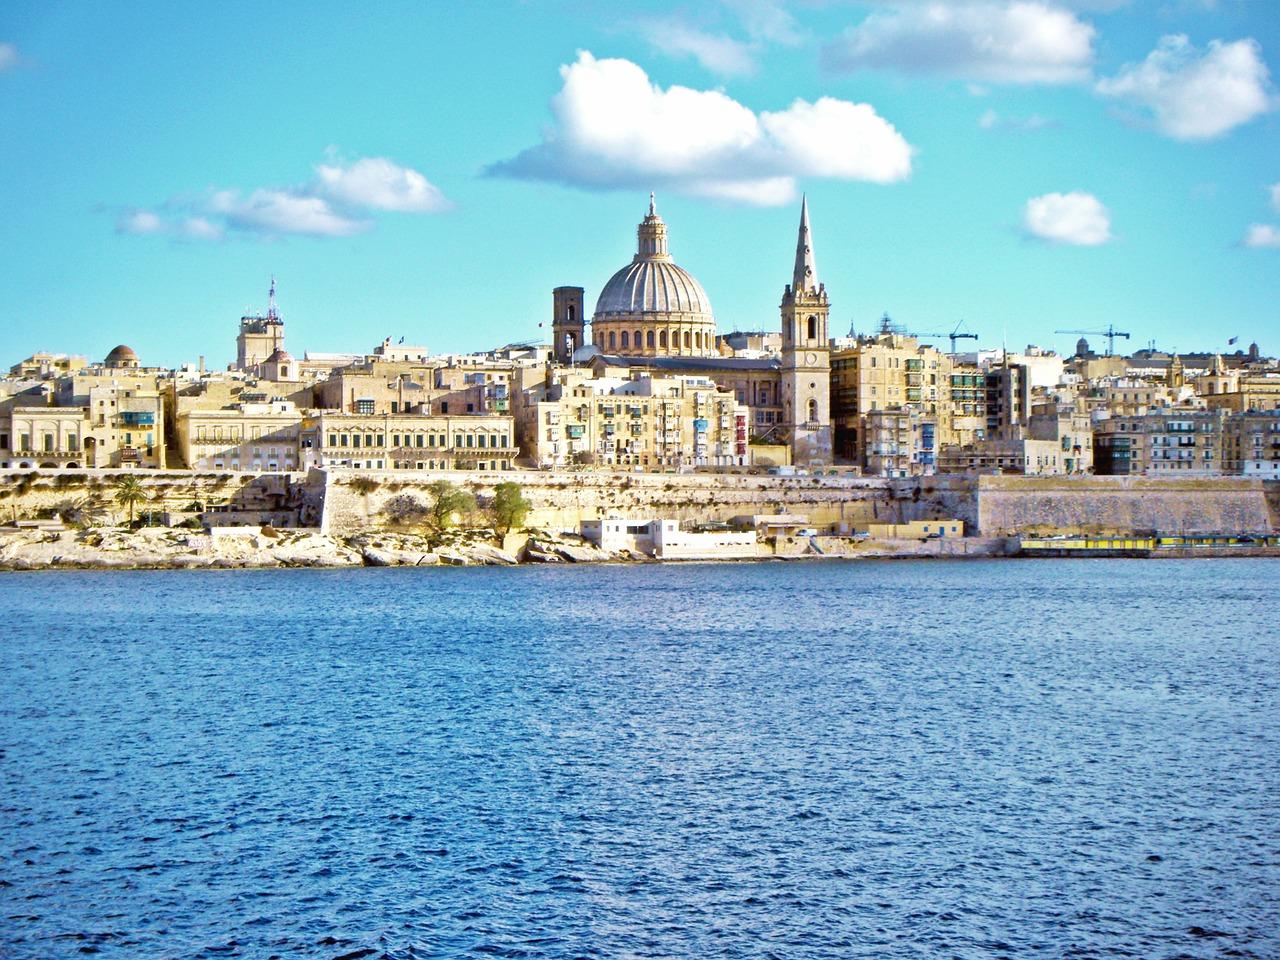 La Vallette, capitale de Malte - CC0 Creative Commons